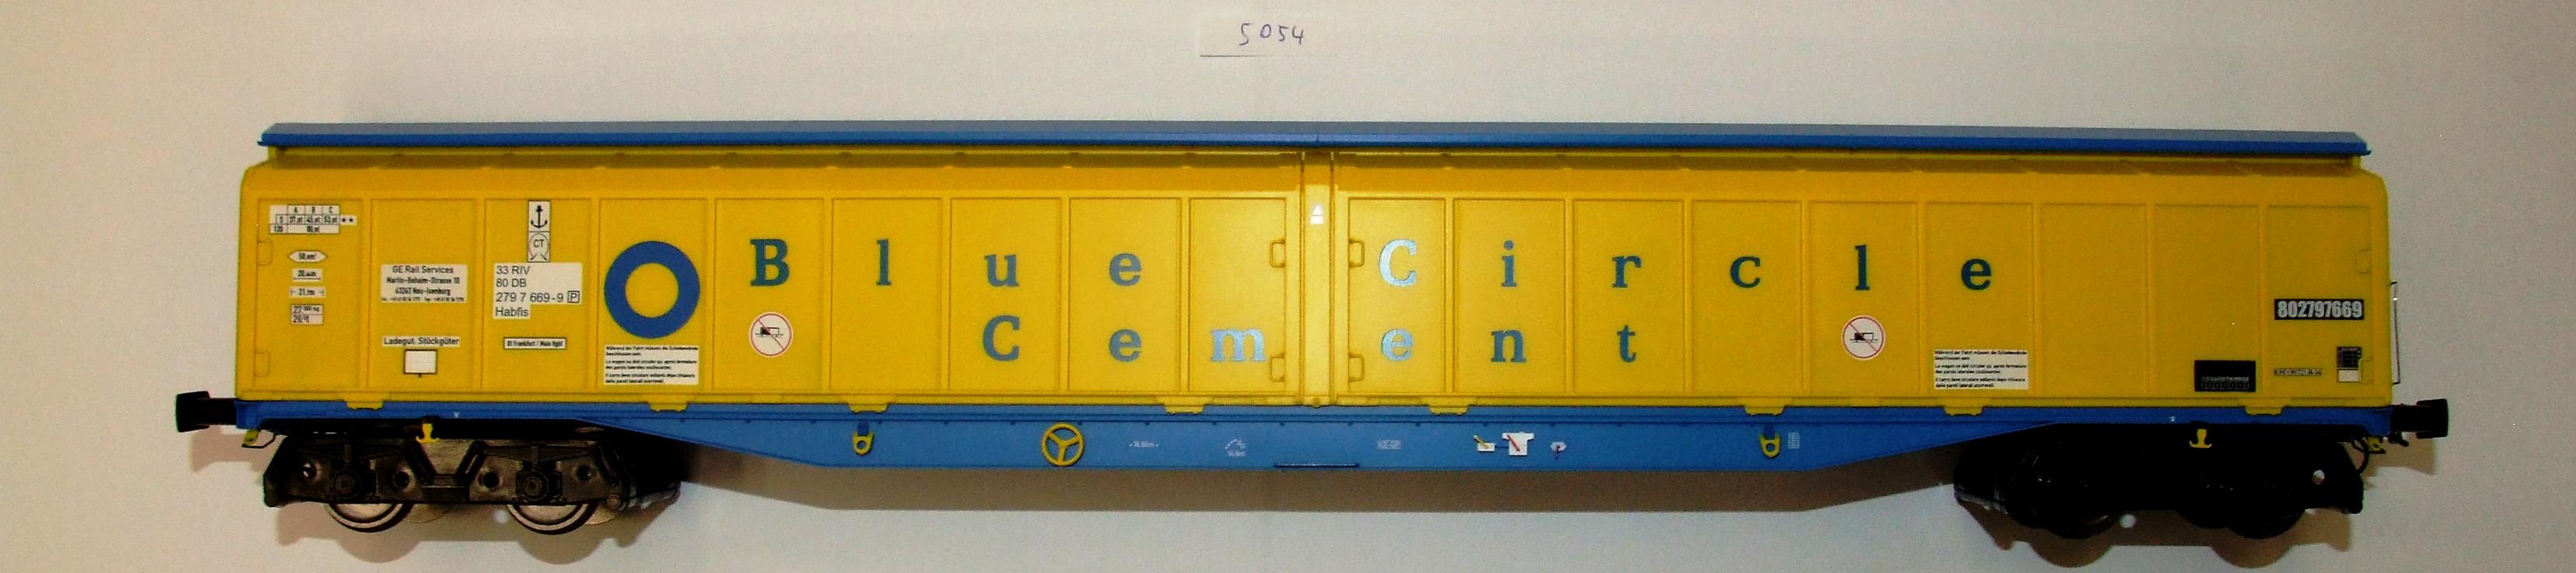 5054 Heljan Spur 0 Güterwagen Habfis H2 DB EP IV/V Blue CIR